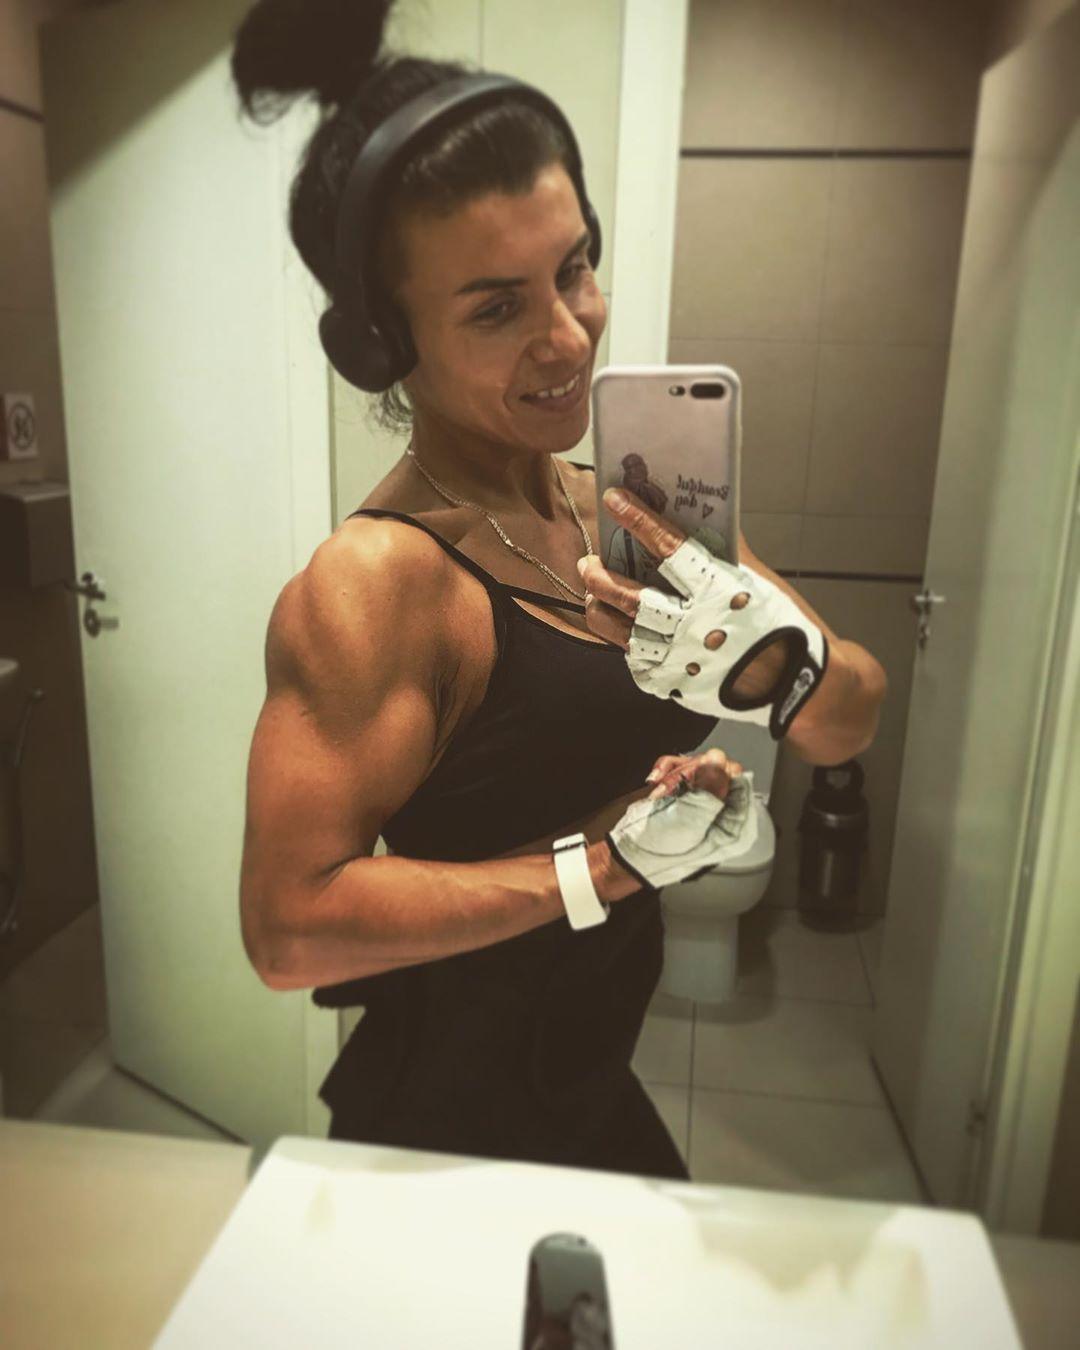 Smile 😁#fitnessmotivation #fitnesssport #fitnessgirl #fitnessmom #fitness #тренировка #sportgirl #sp...